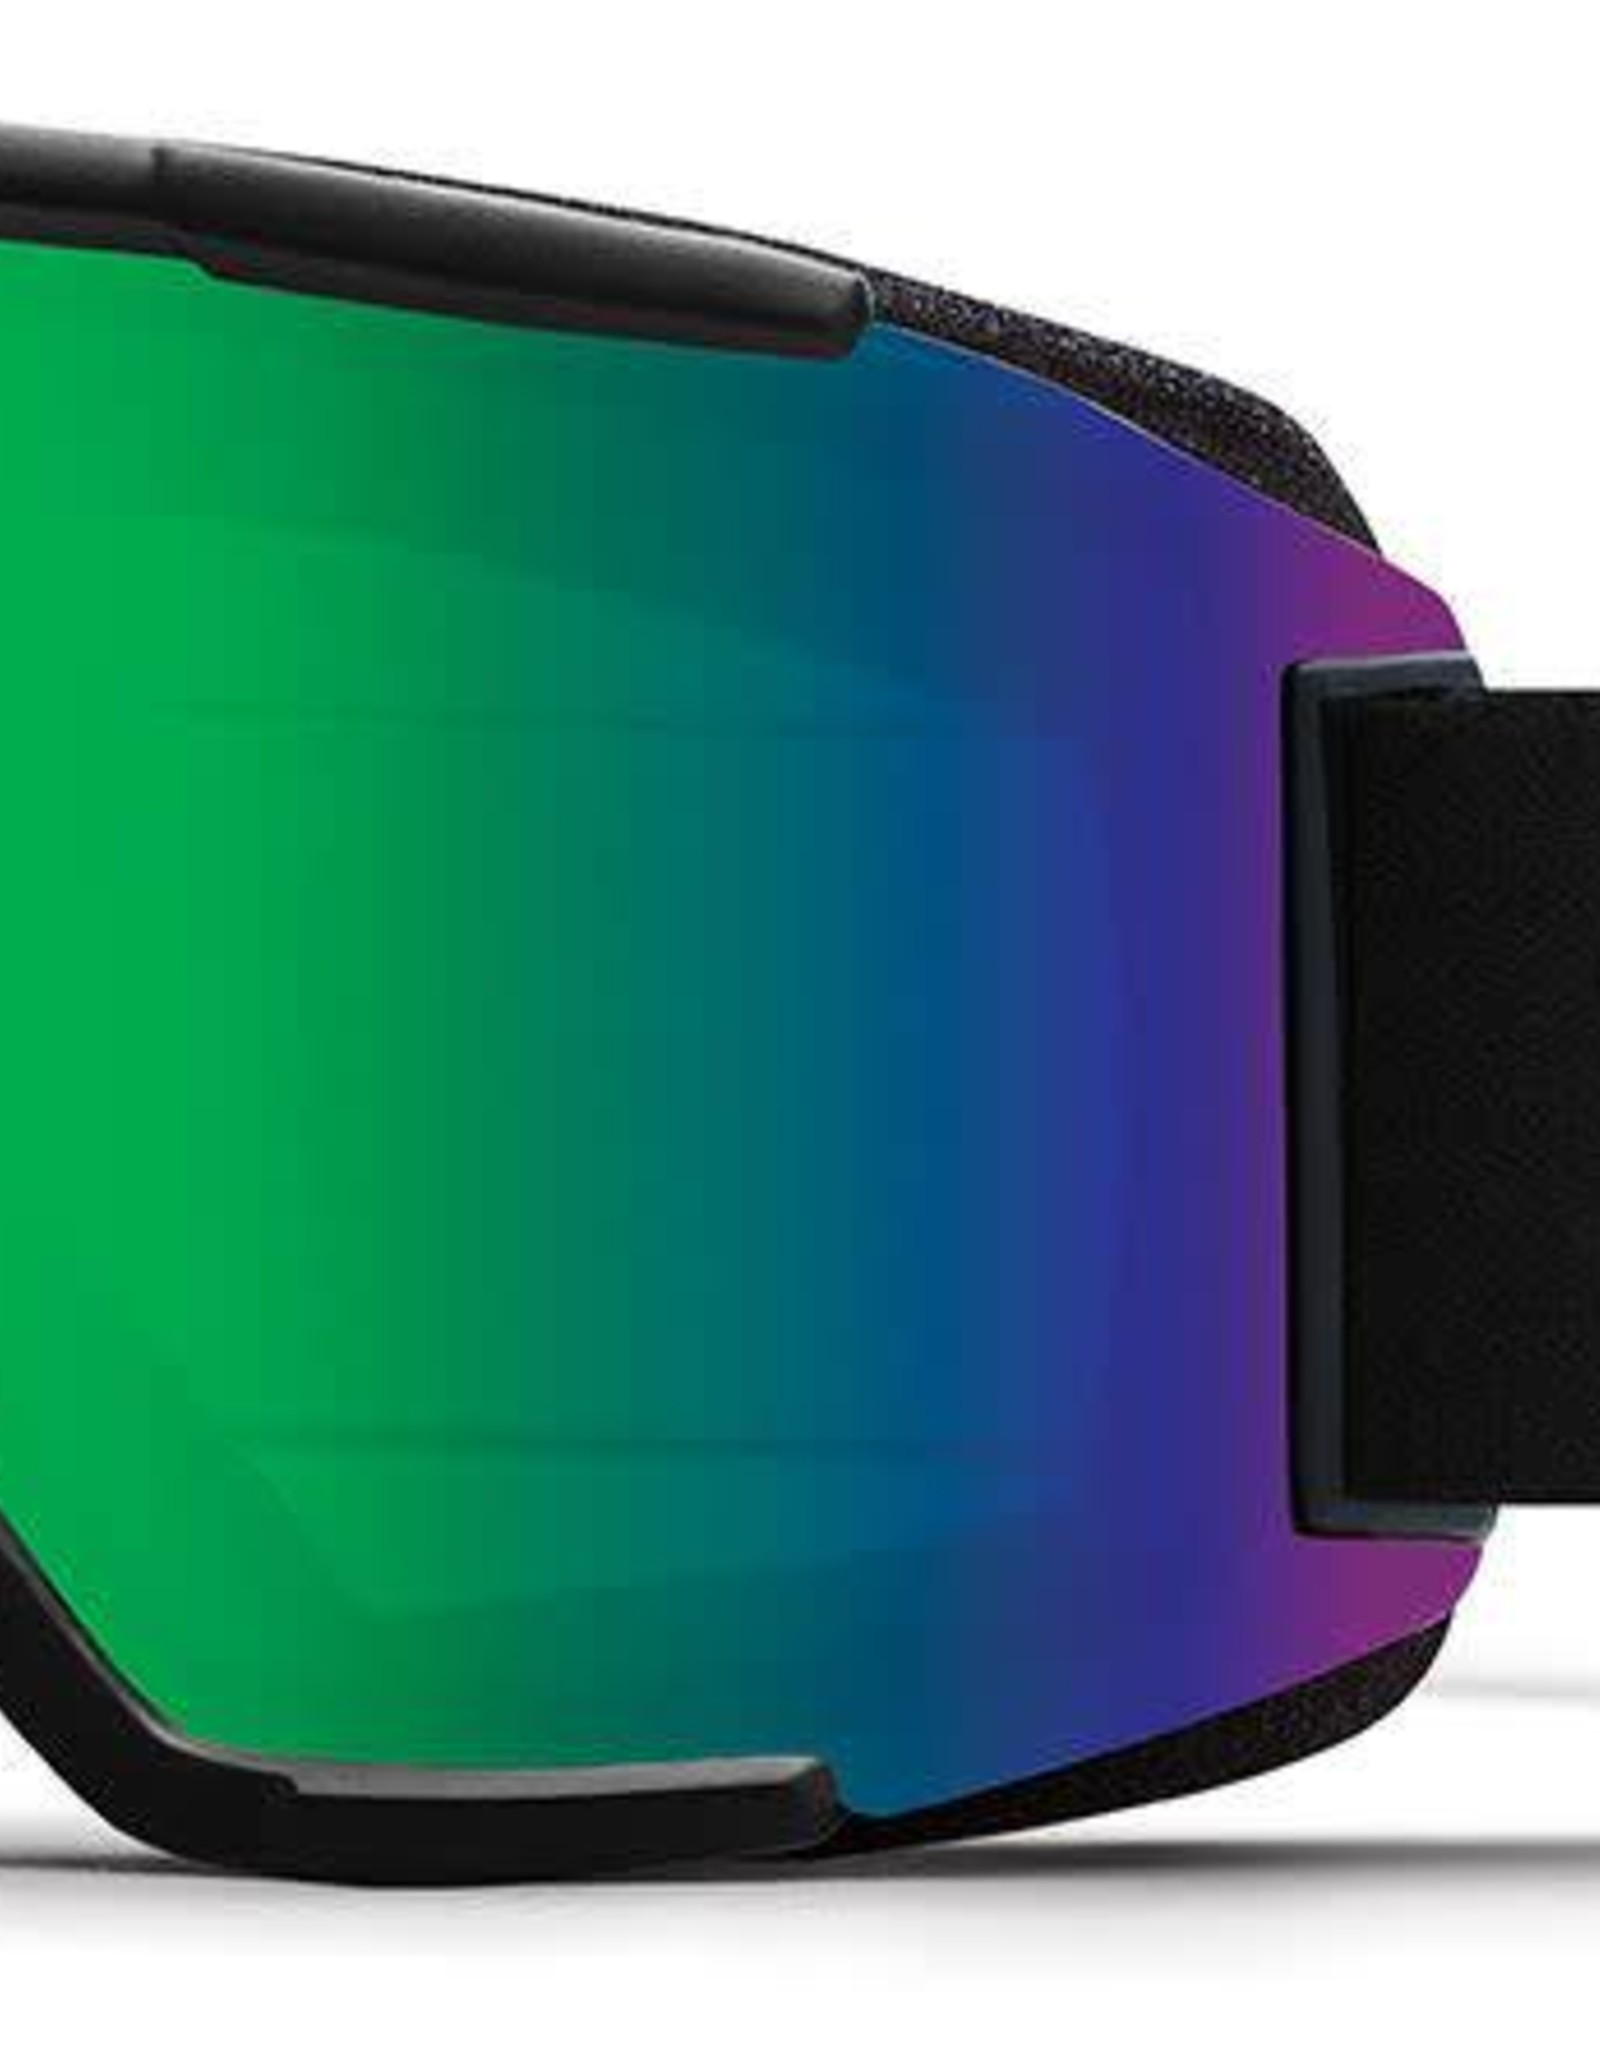 Smith Optics Smith - SQUAD - Black w/ CP Sun Green Mirror + Bonus Lens